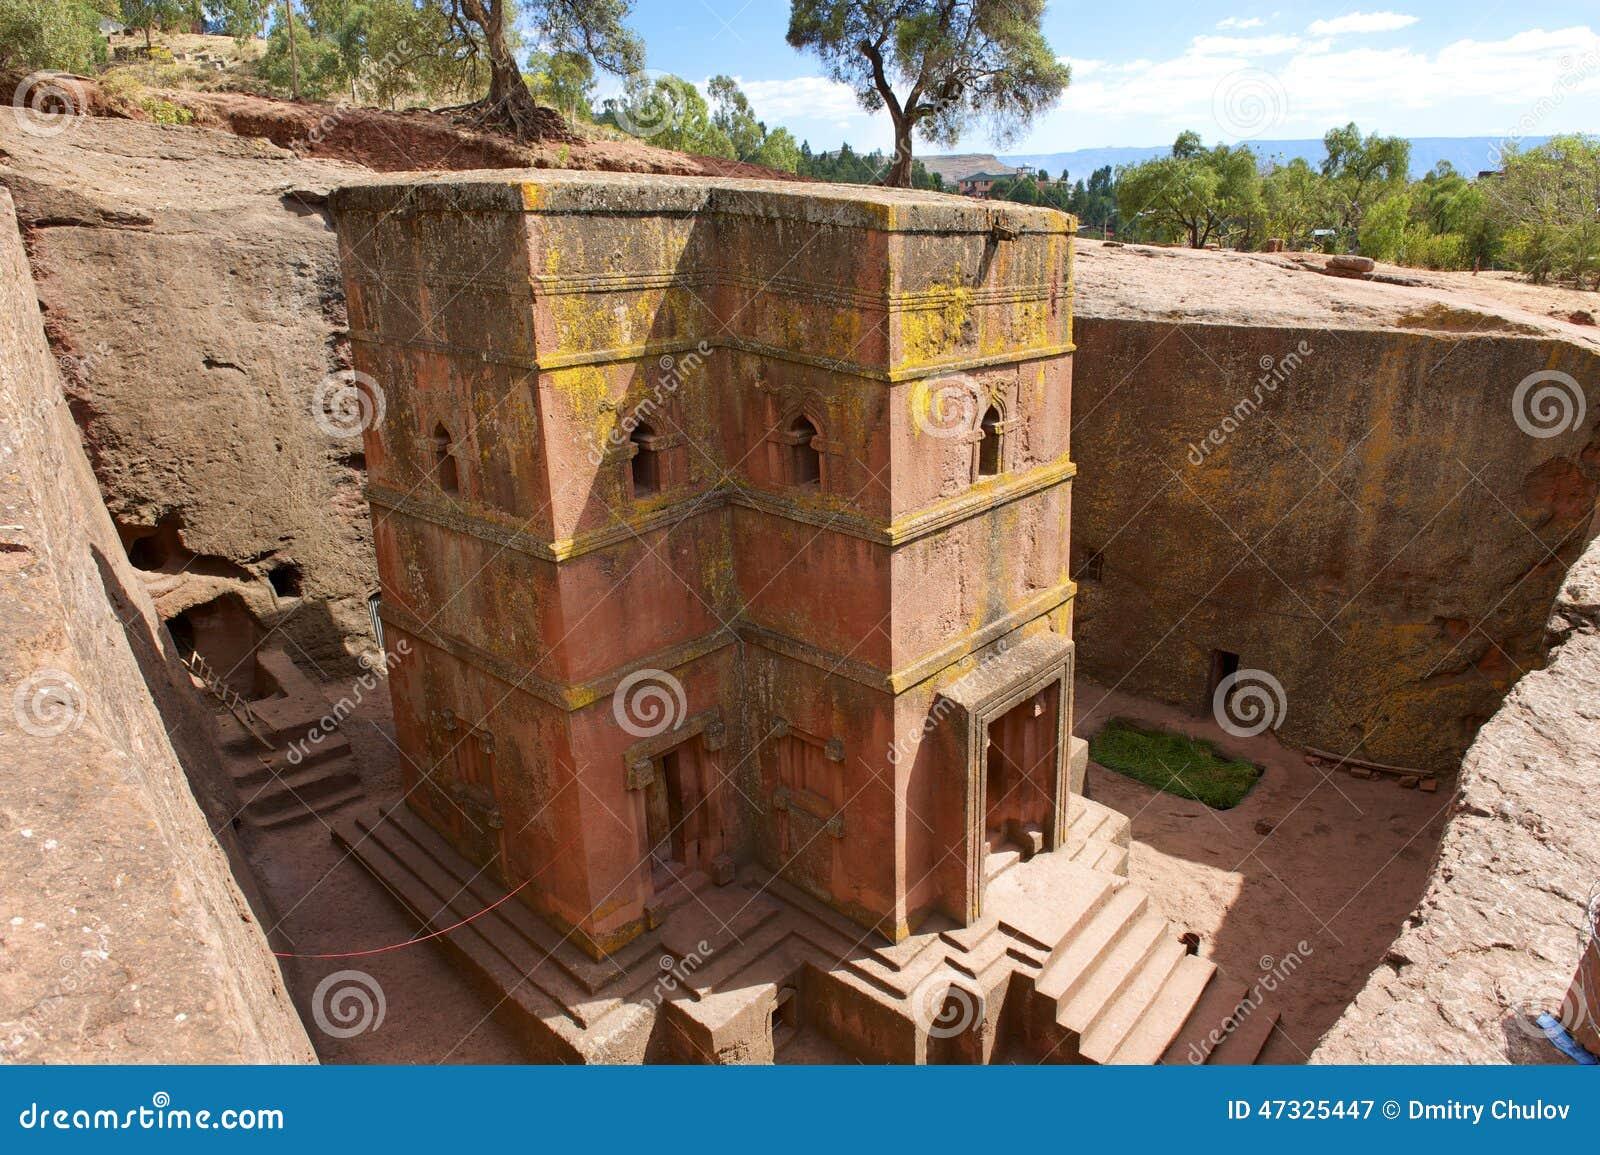 Unique monolithic rock-hewn Church of St. George, UNESCO World heritage, Lalibela, Ethiopia.